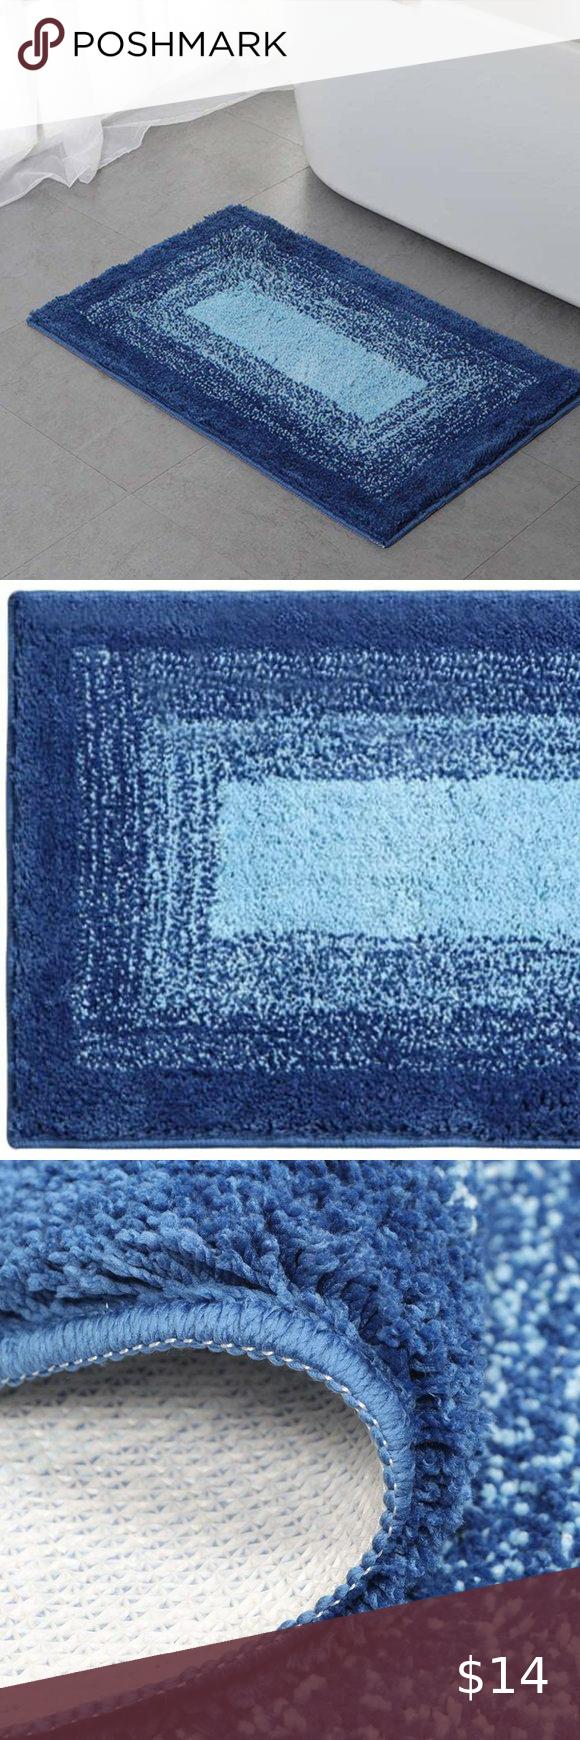 Nwot Bathroom Rug Bath Floor Mats Bathroom Rugs Rugs [ 1740 x 580 Pixel ]